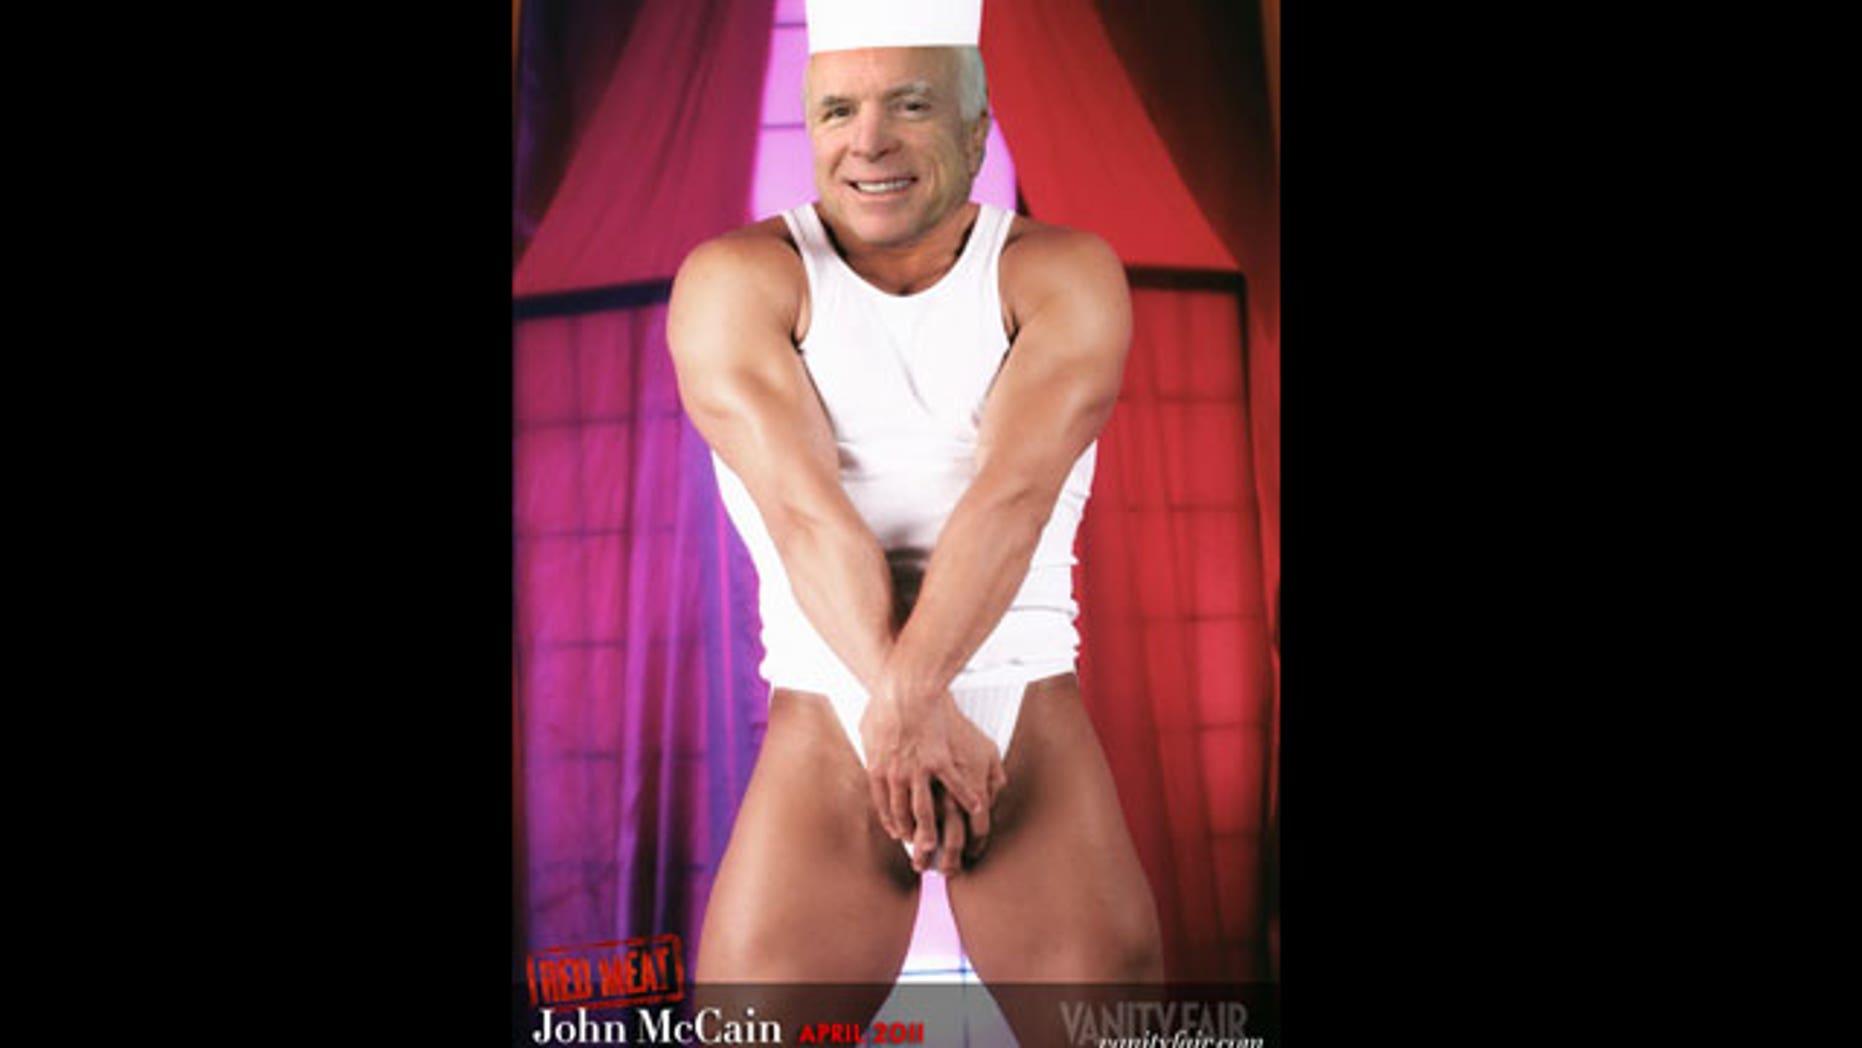 A Vanity Fair calendar features Republican Senator John McCain's head digitally added to the body of a male model.